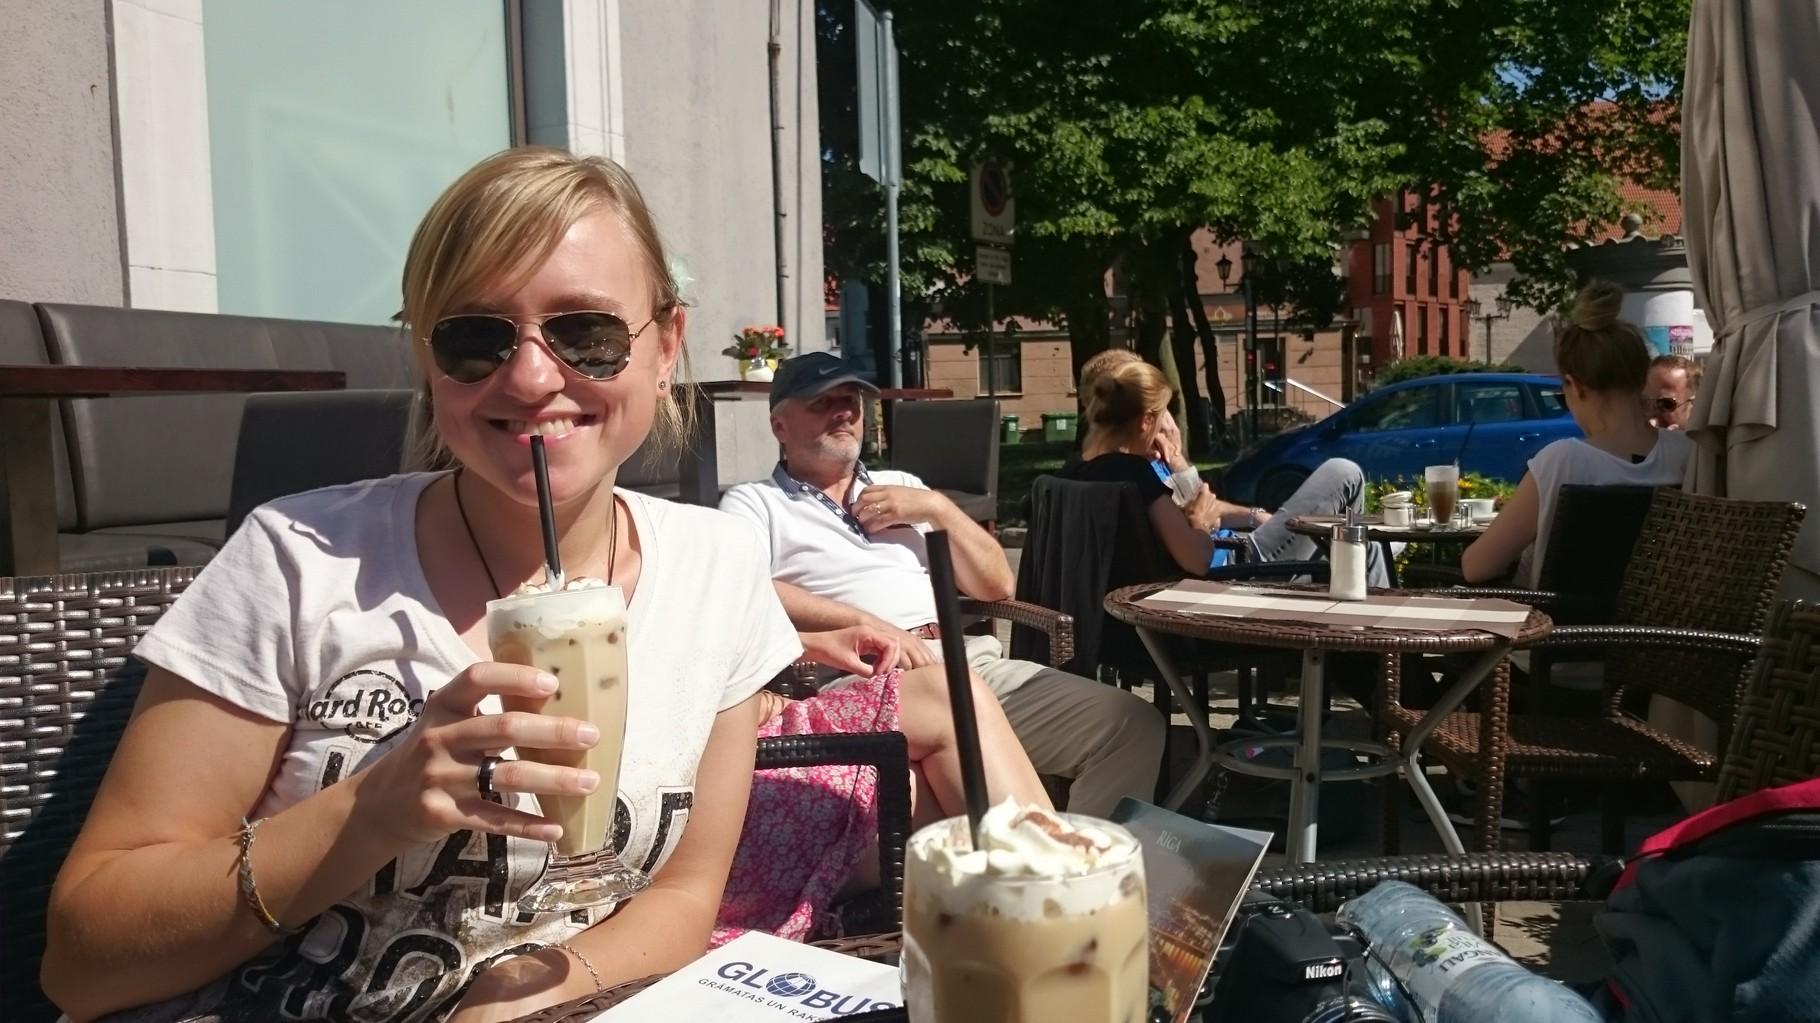 Eiskaffee....mmhh....lecker!!